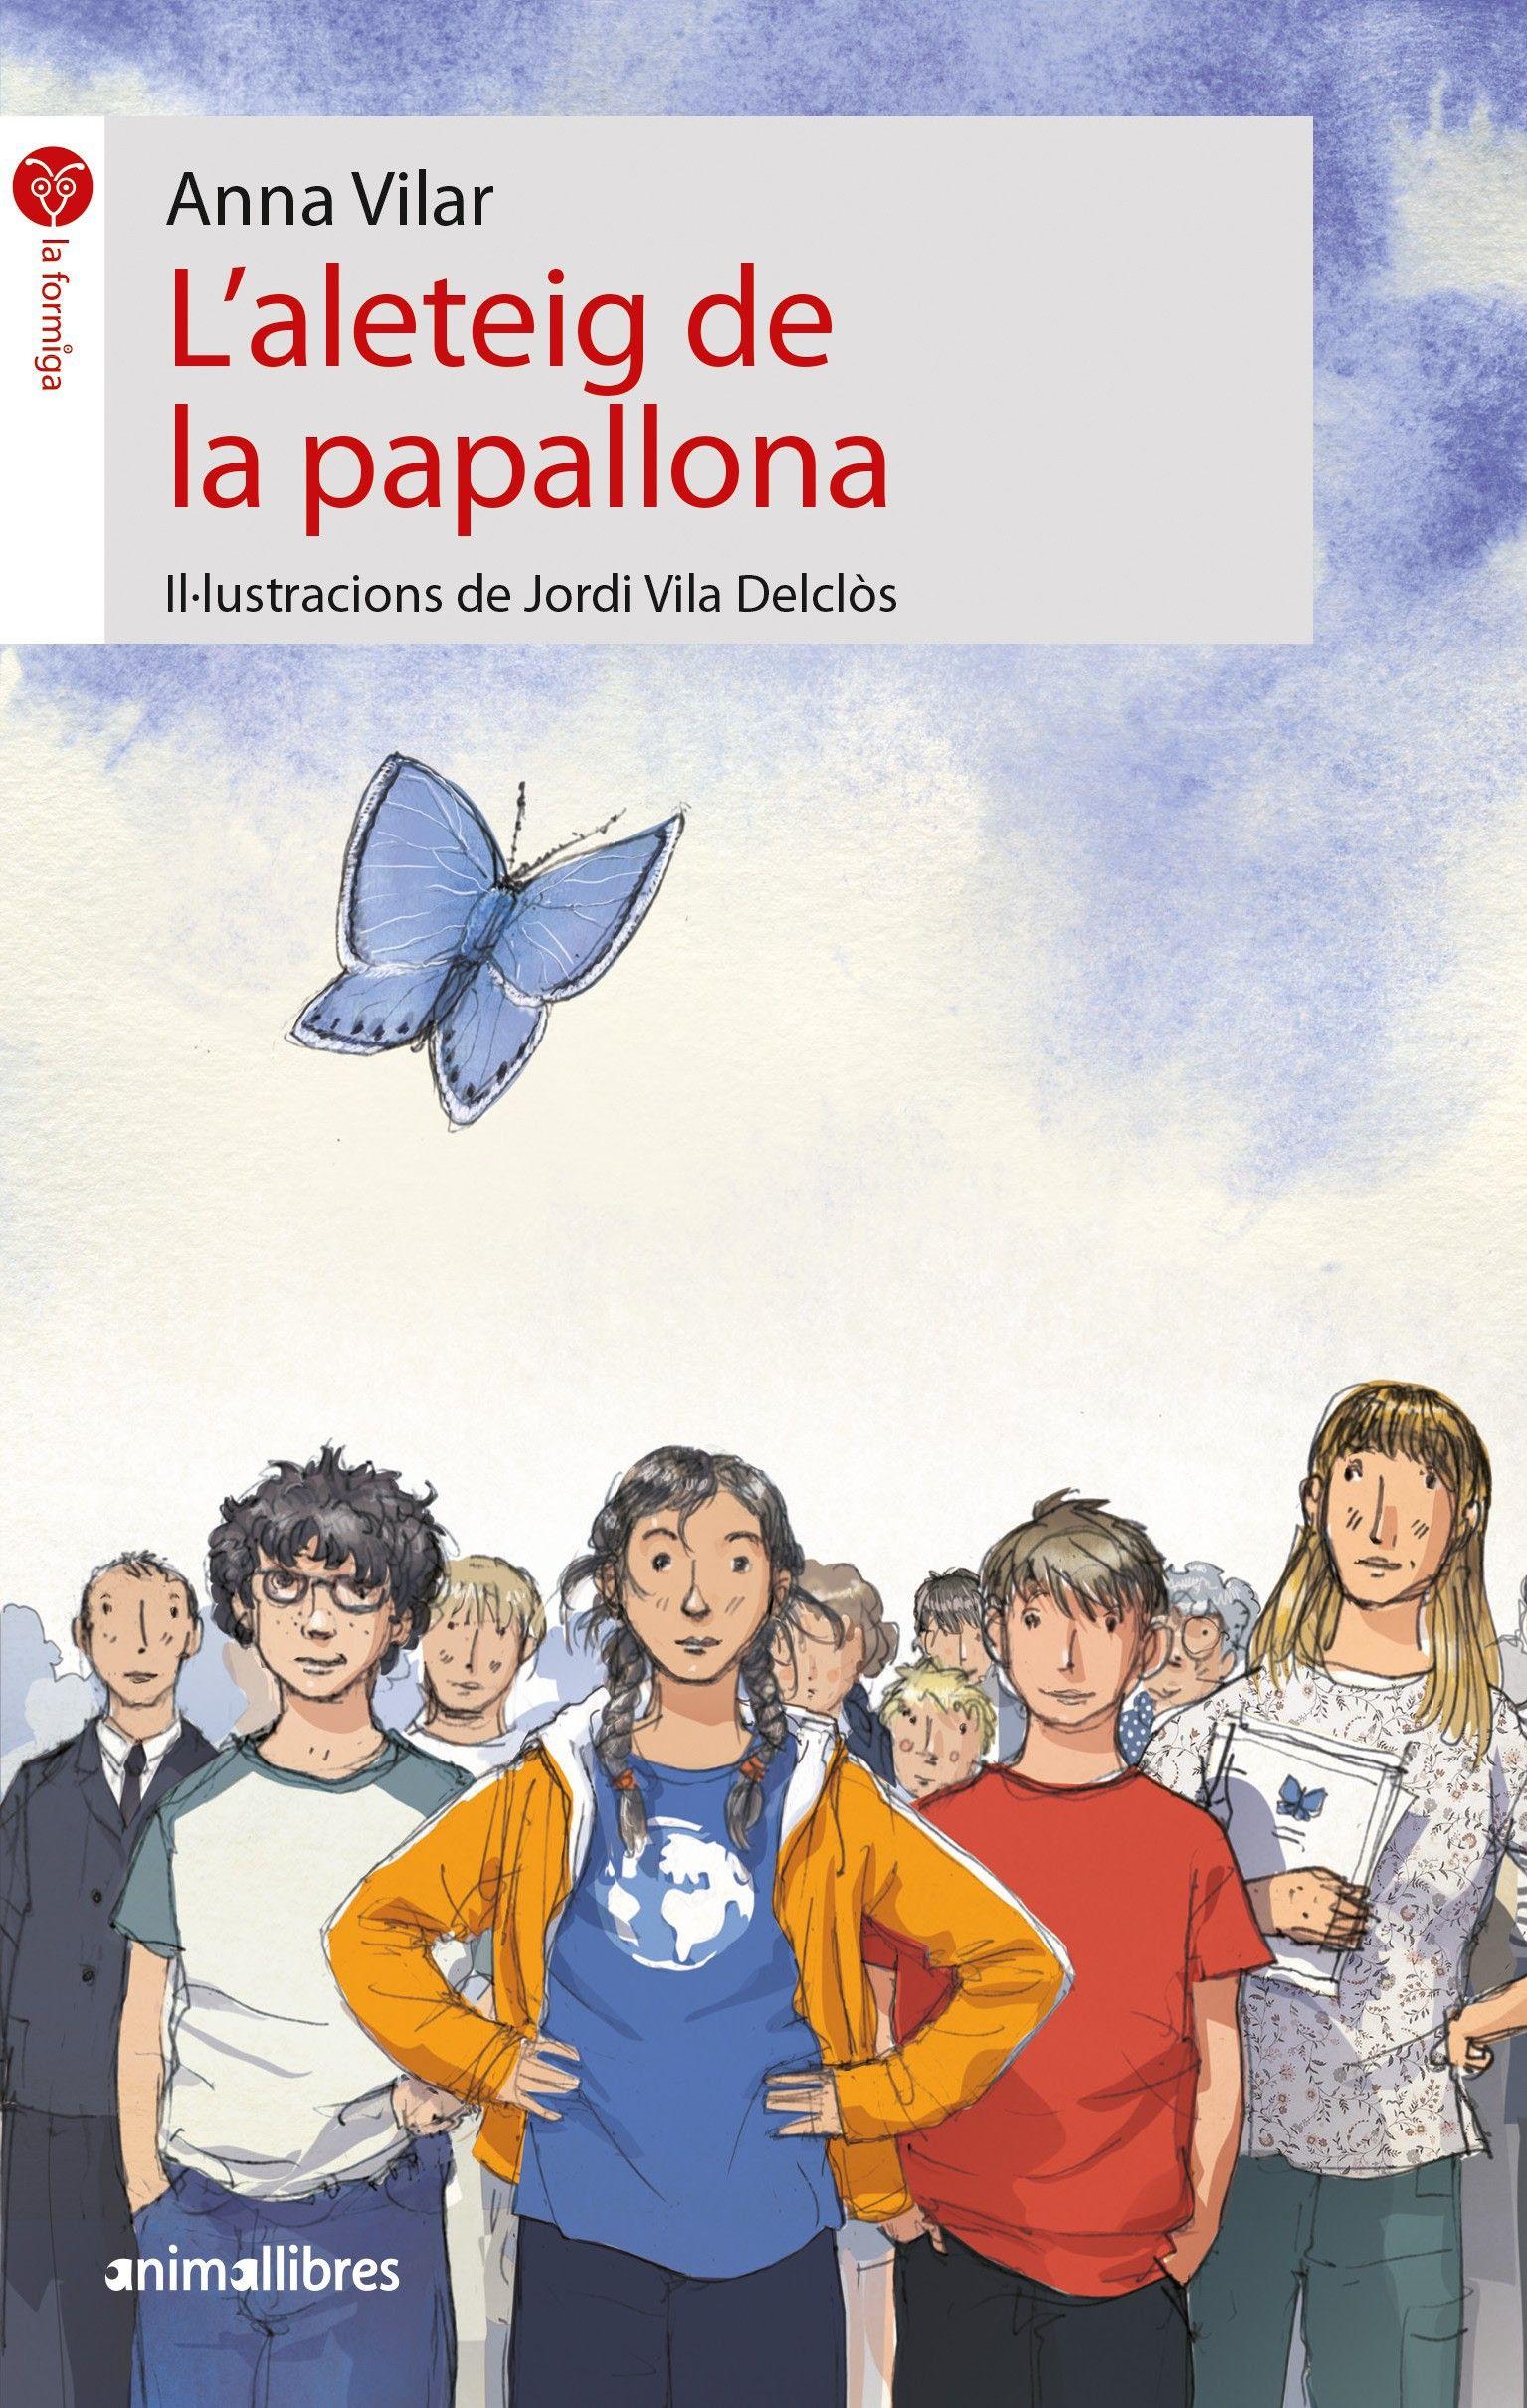 ALETEIG DE LA PAPALLONA L